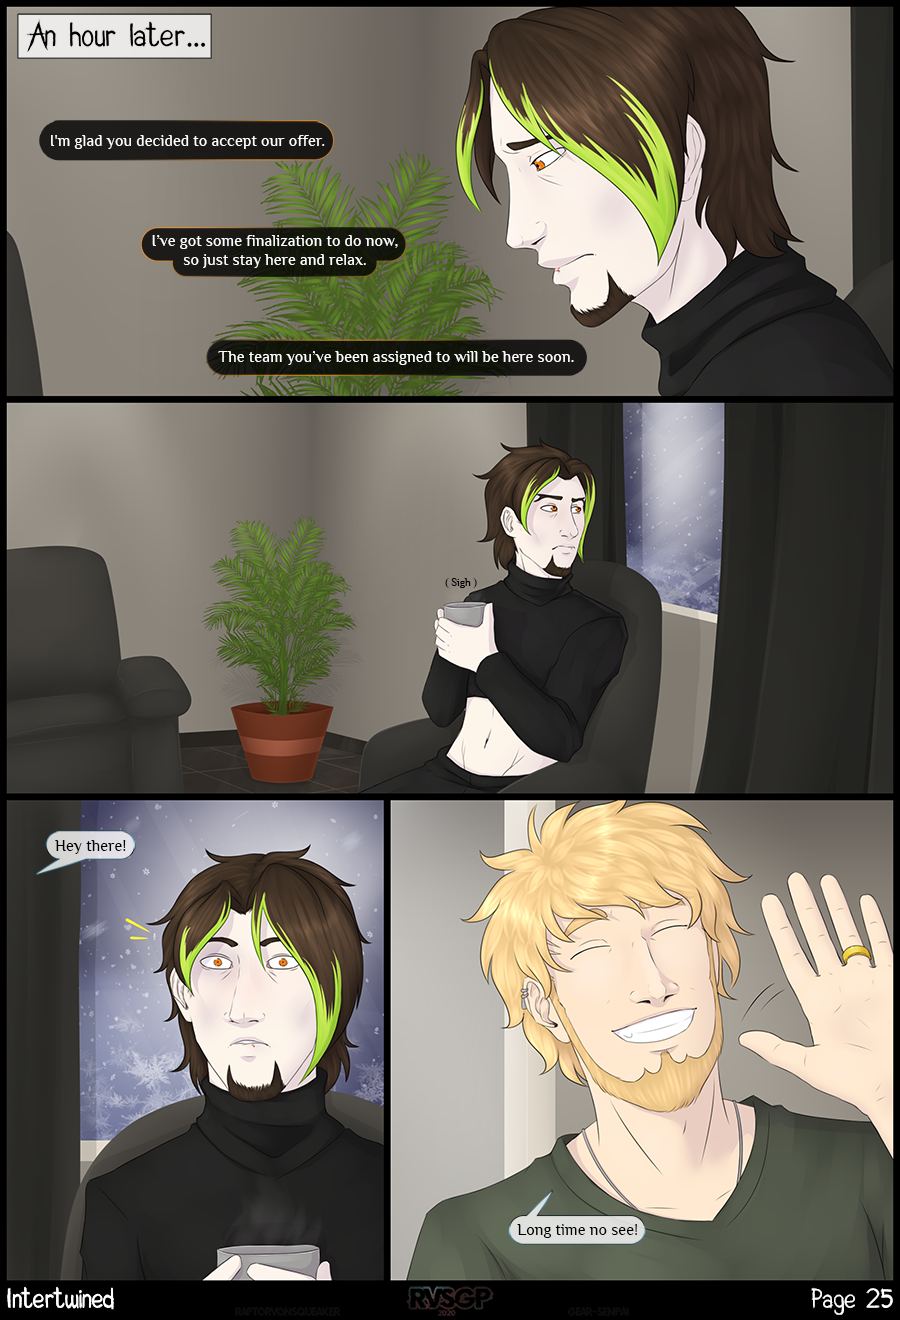 Page 25 - Familiar Face.